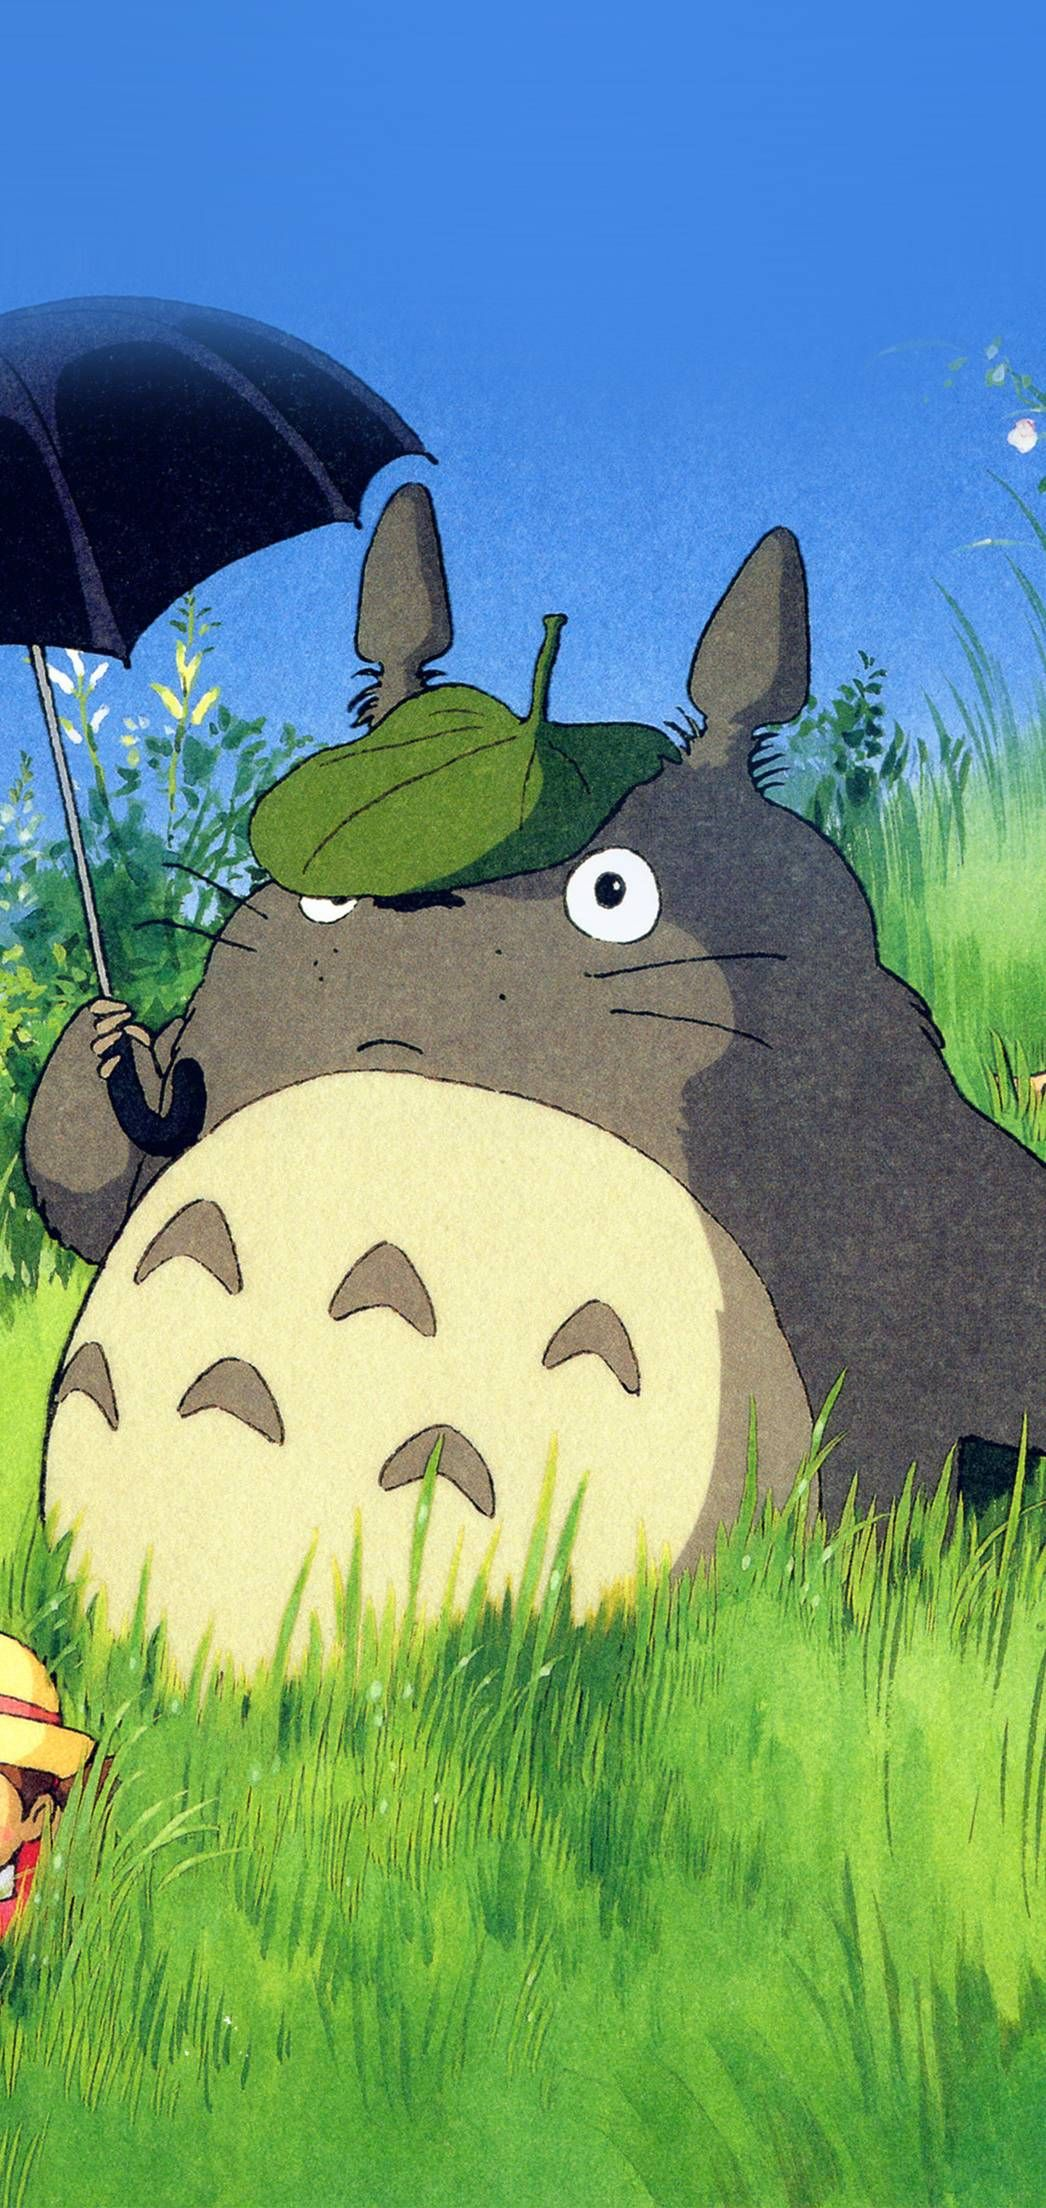 Top Collection Phone And Desktop Wallpaper Hd Ghibli Artwork Totoro Art Studio Ghibli Background